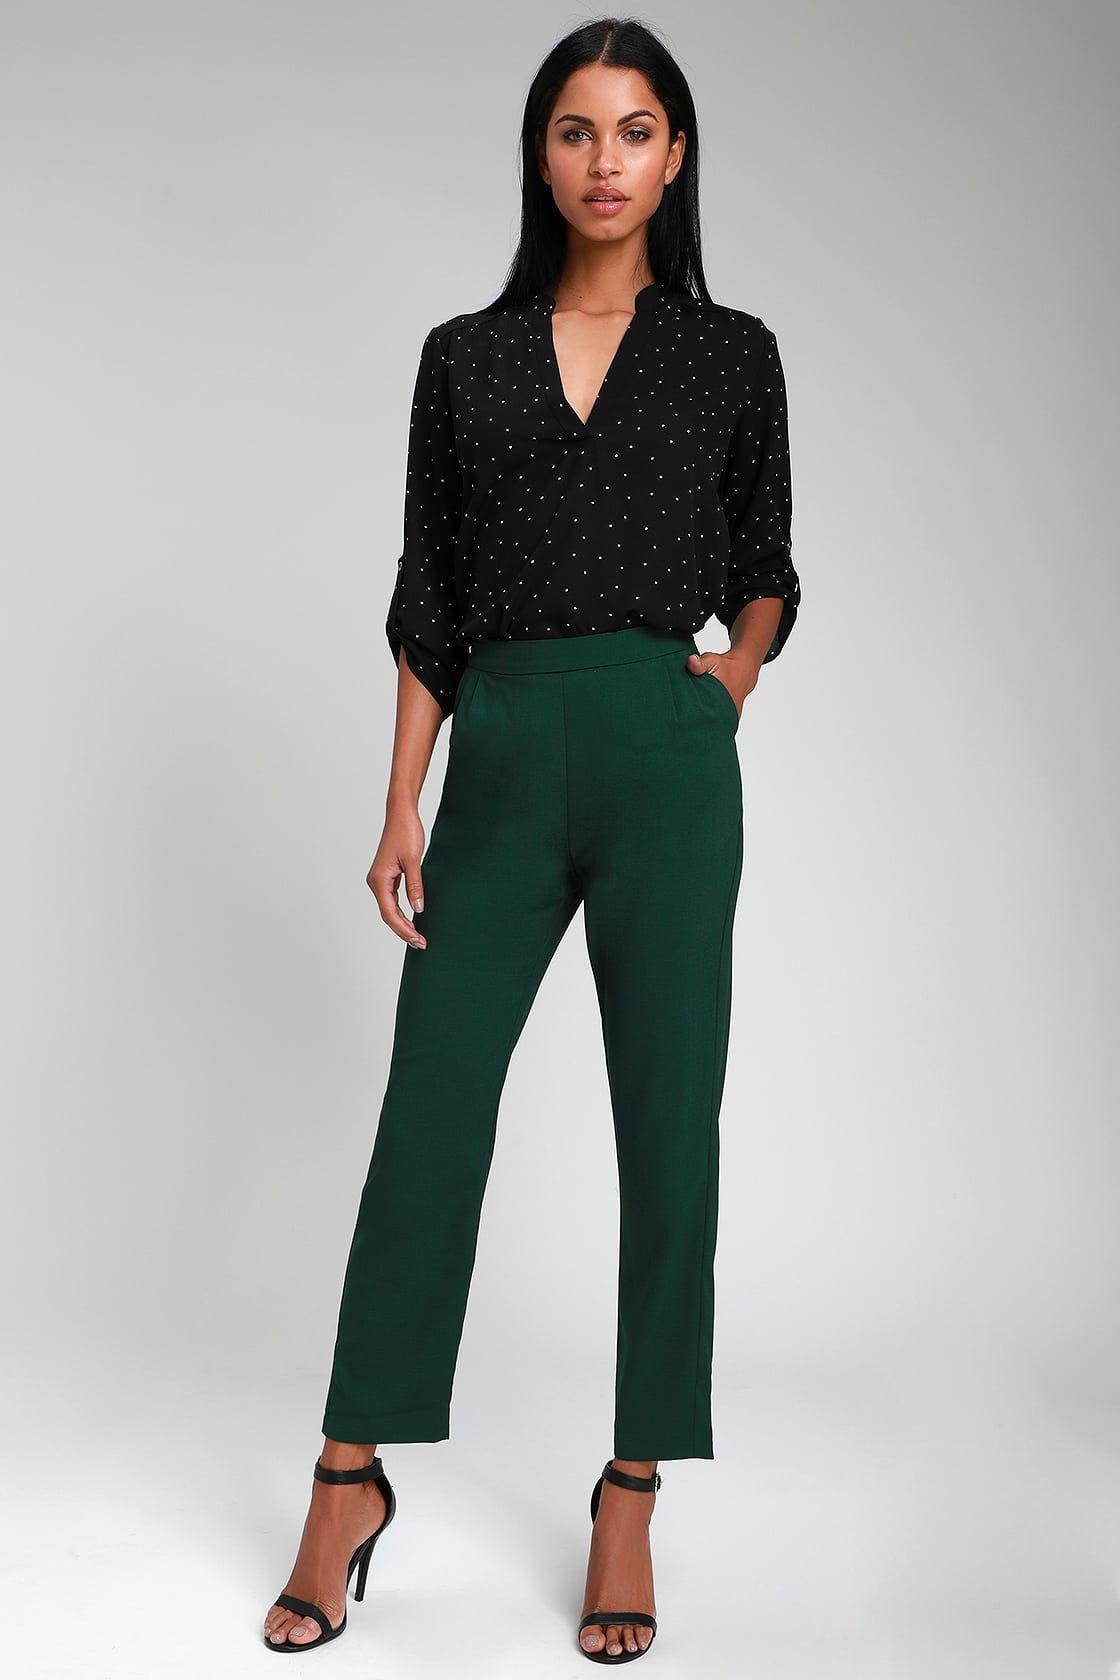 Kick It Forest Green High Waisted Trouser Pants Summer Work Outfits Green Dress Pants High Waisted Trouser Pants [ 1680 x 1120 Pixel ]